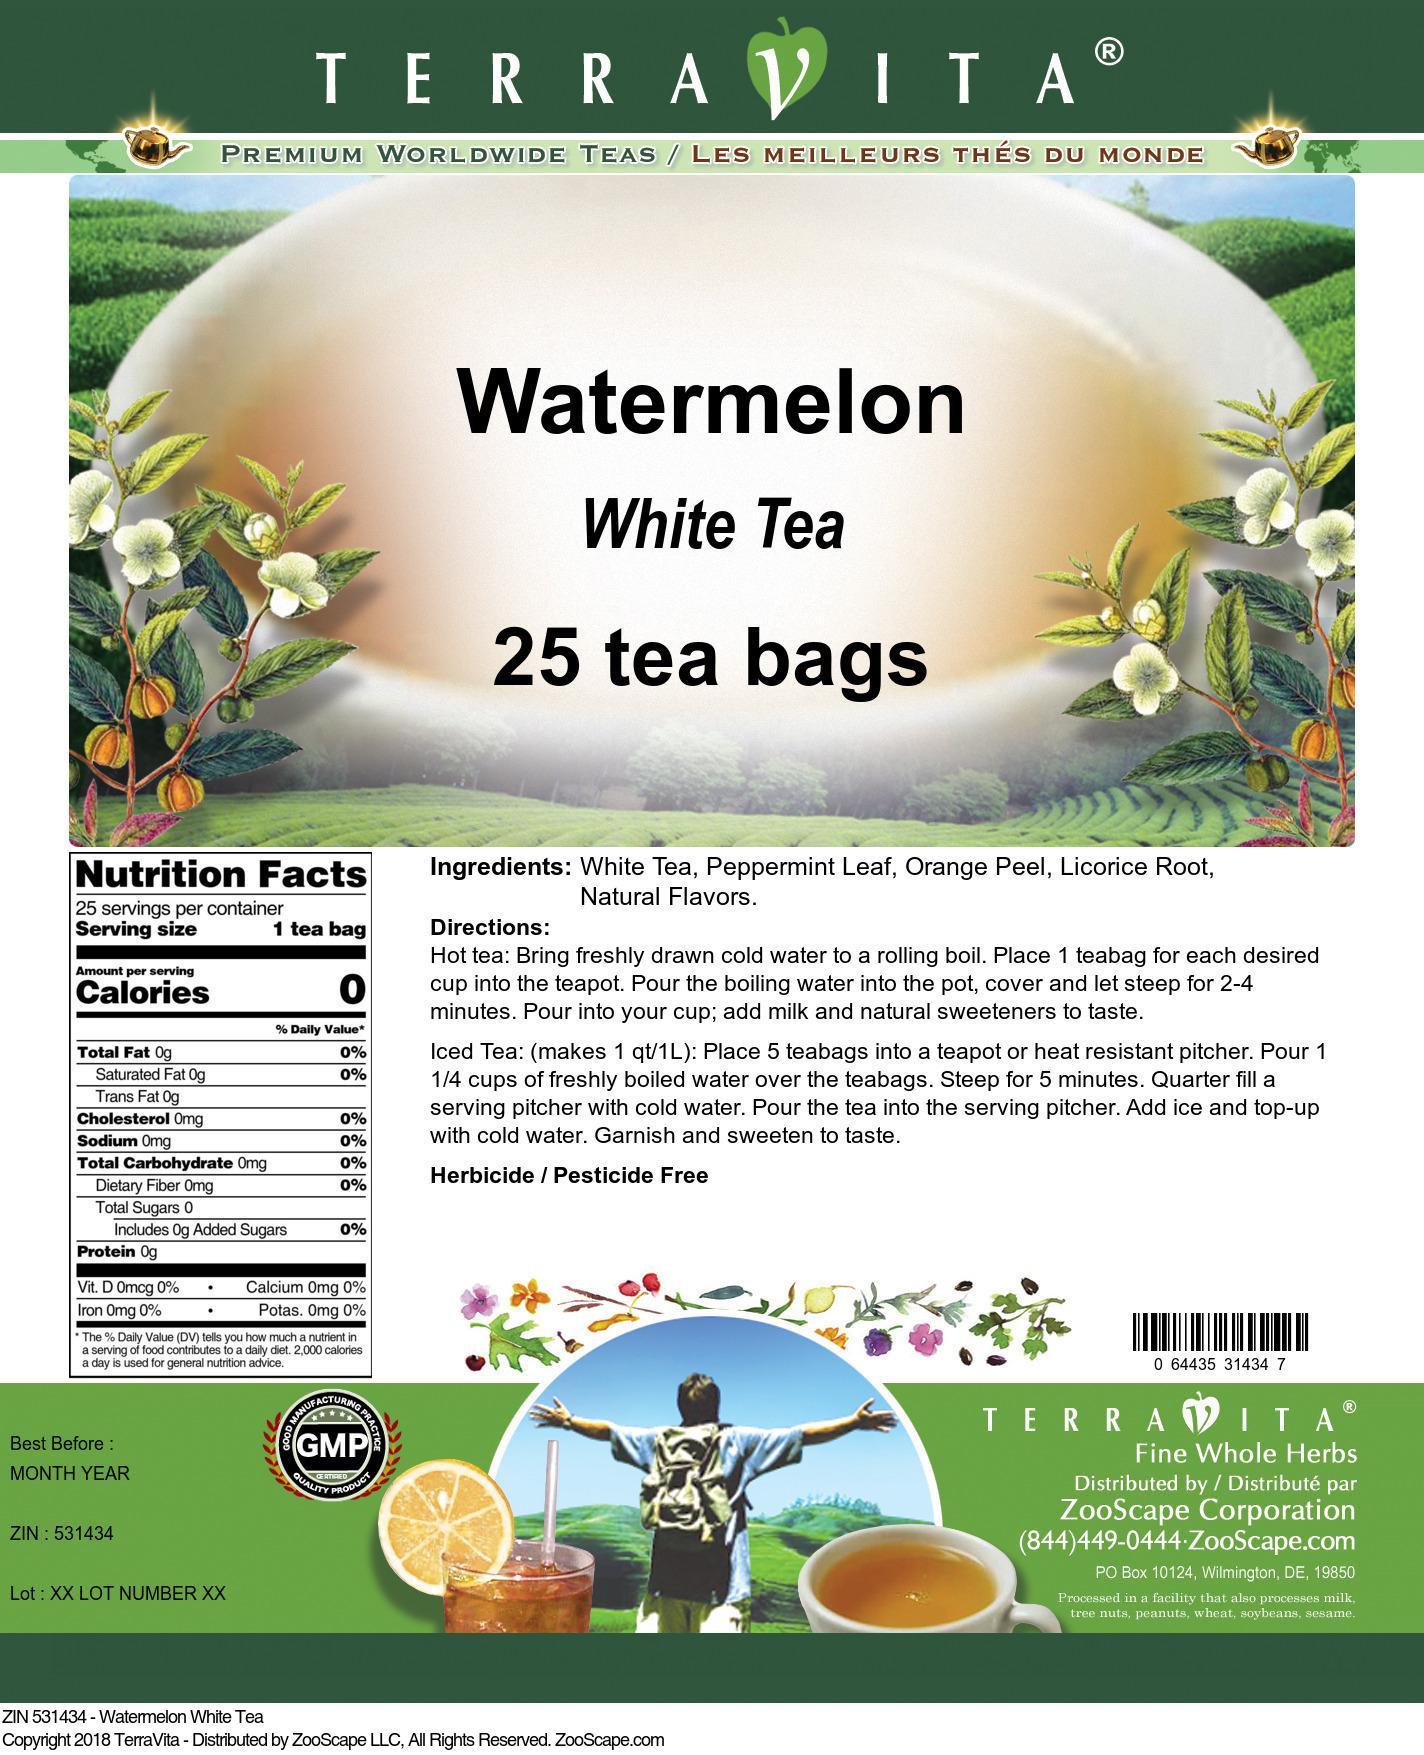 Watermelon White Tea